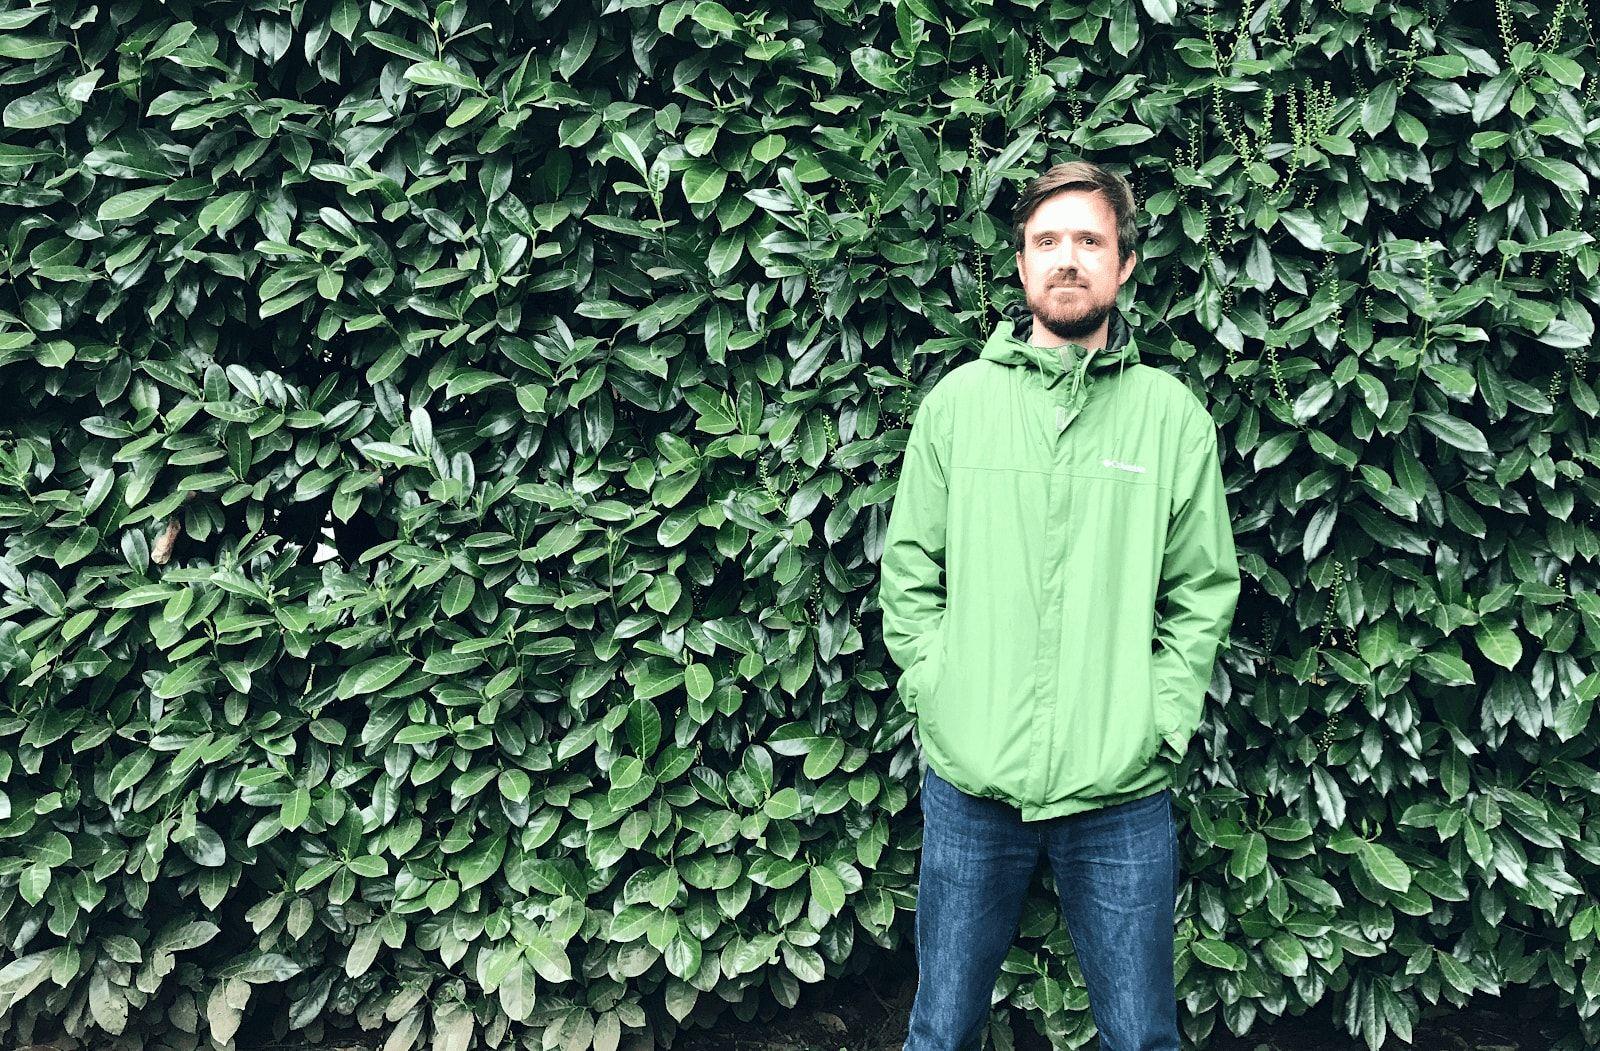 Gabe Ragland, founder of Divjoy